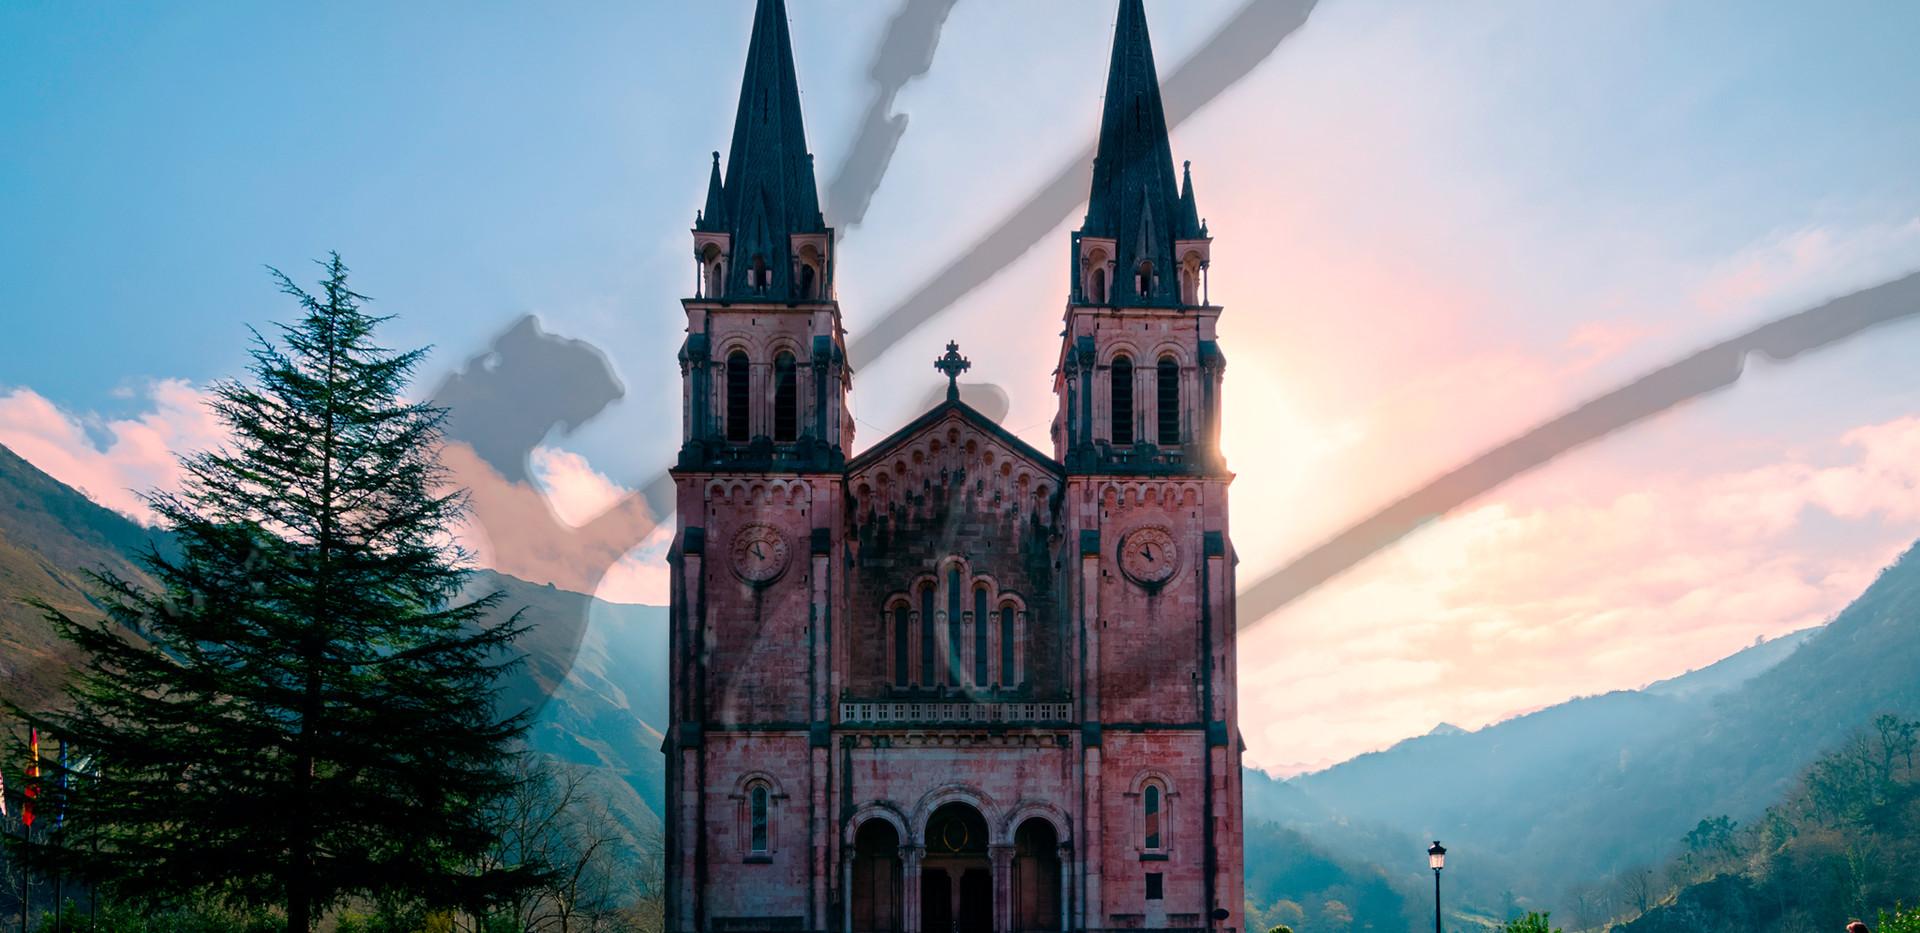 The-Sanctuary.jpg